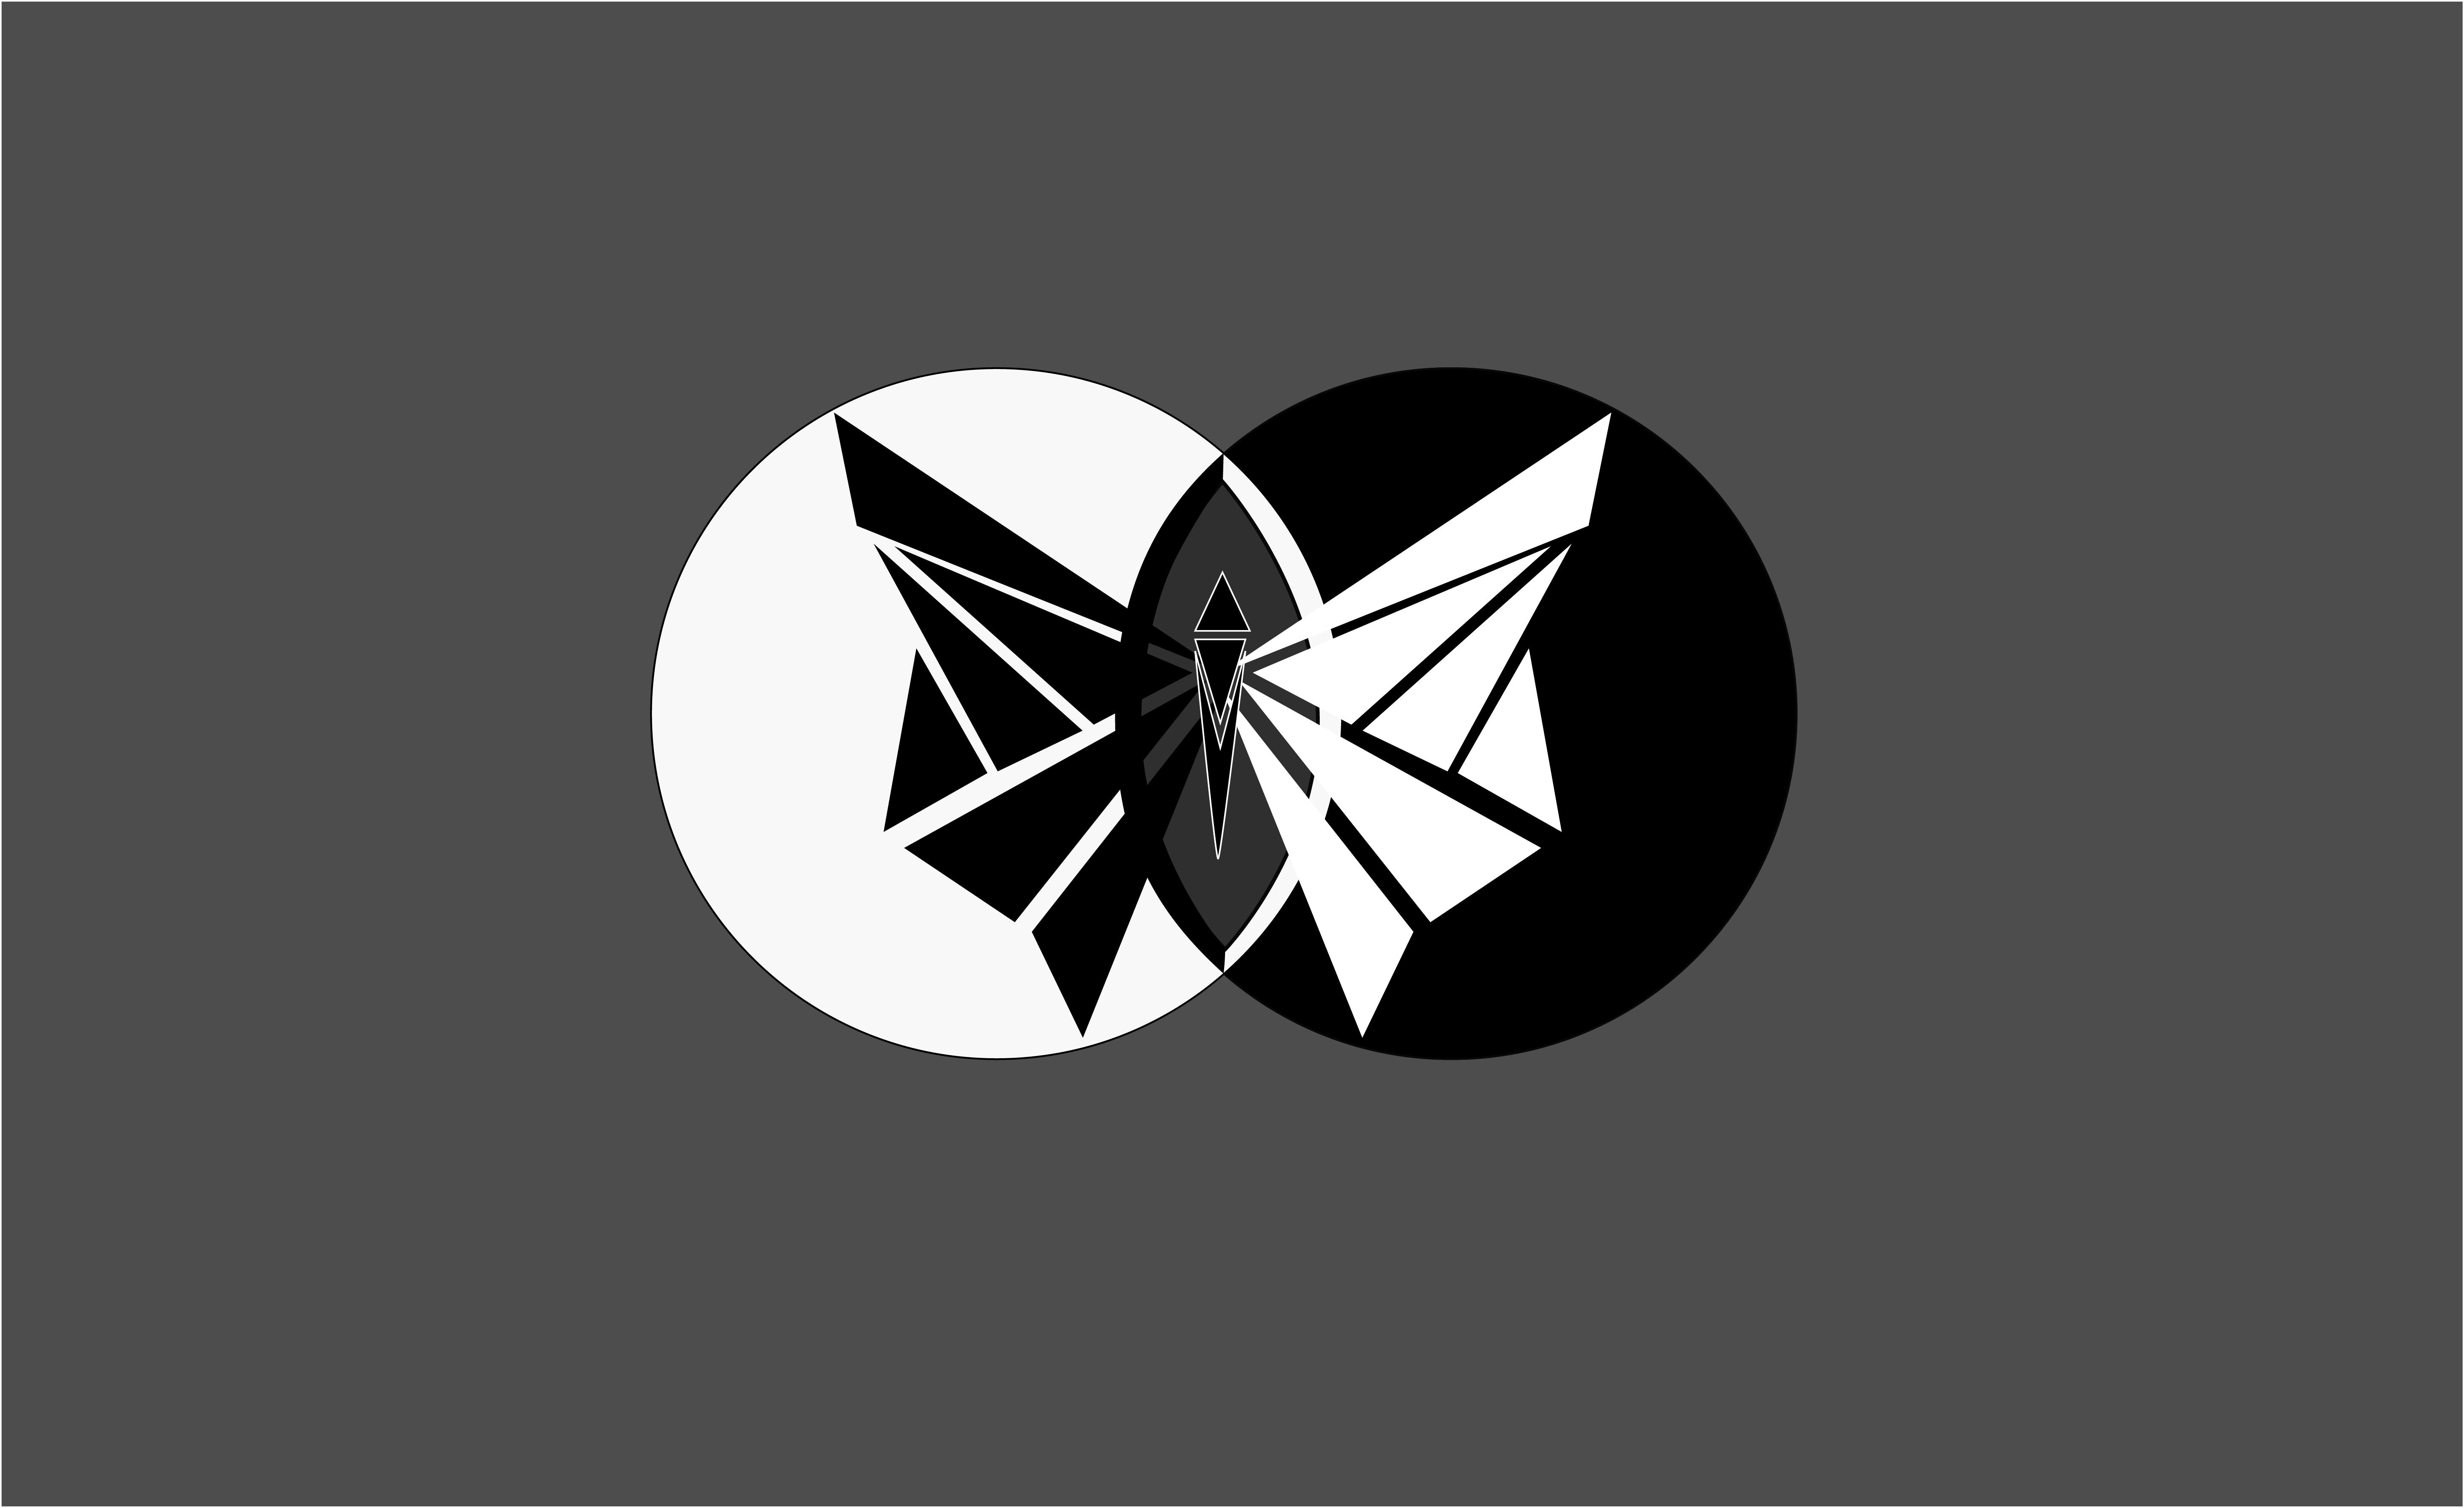 kelebekpiscis-4